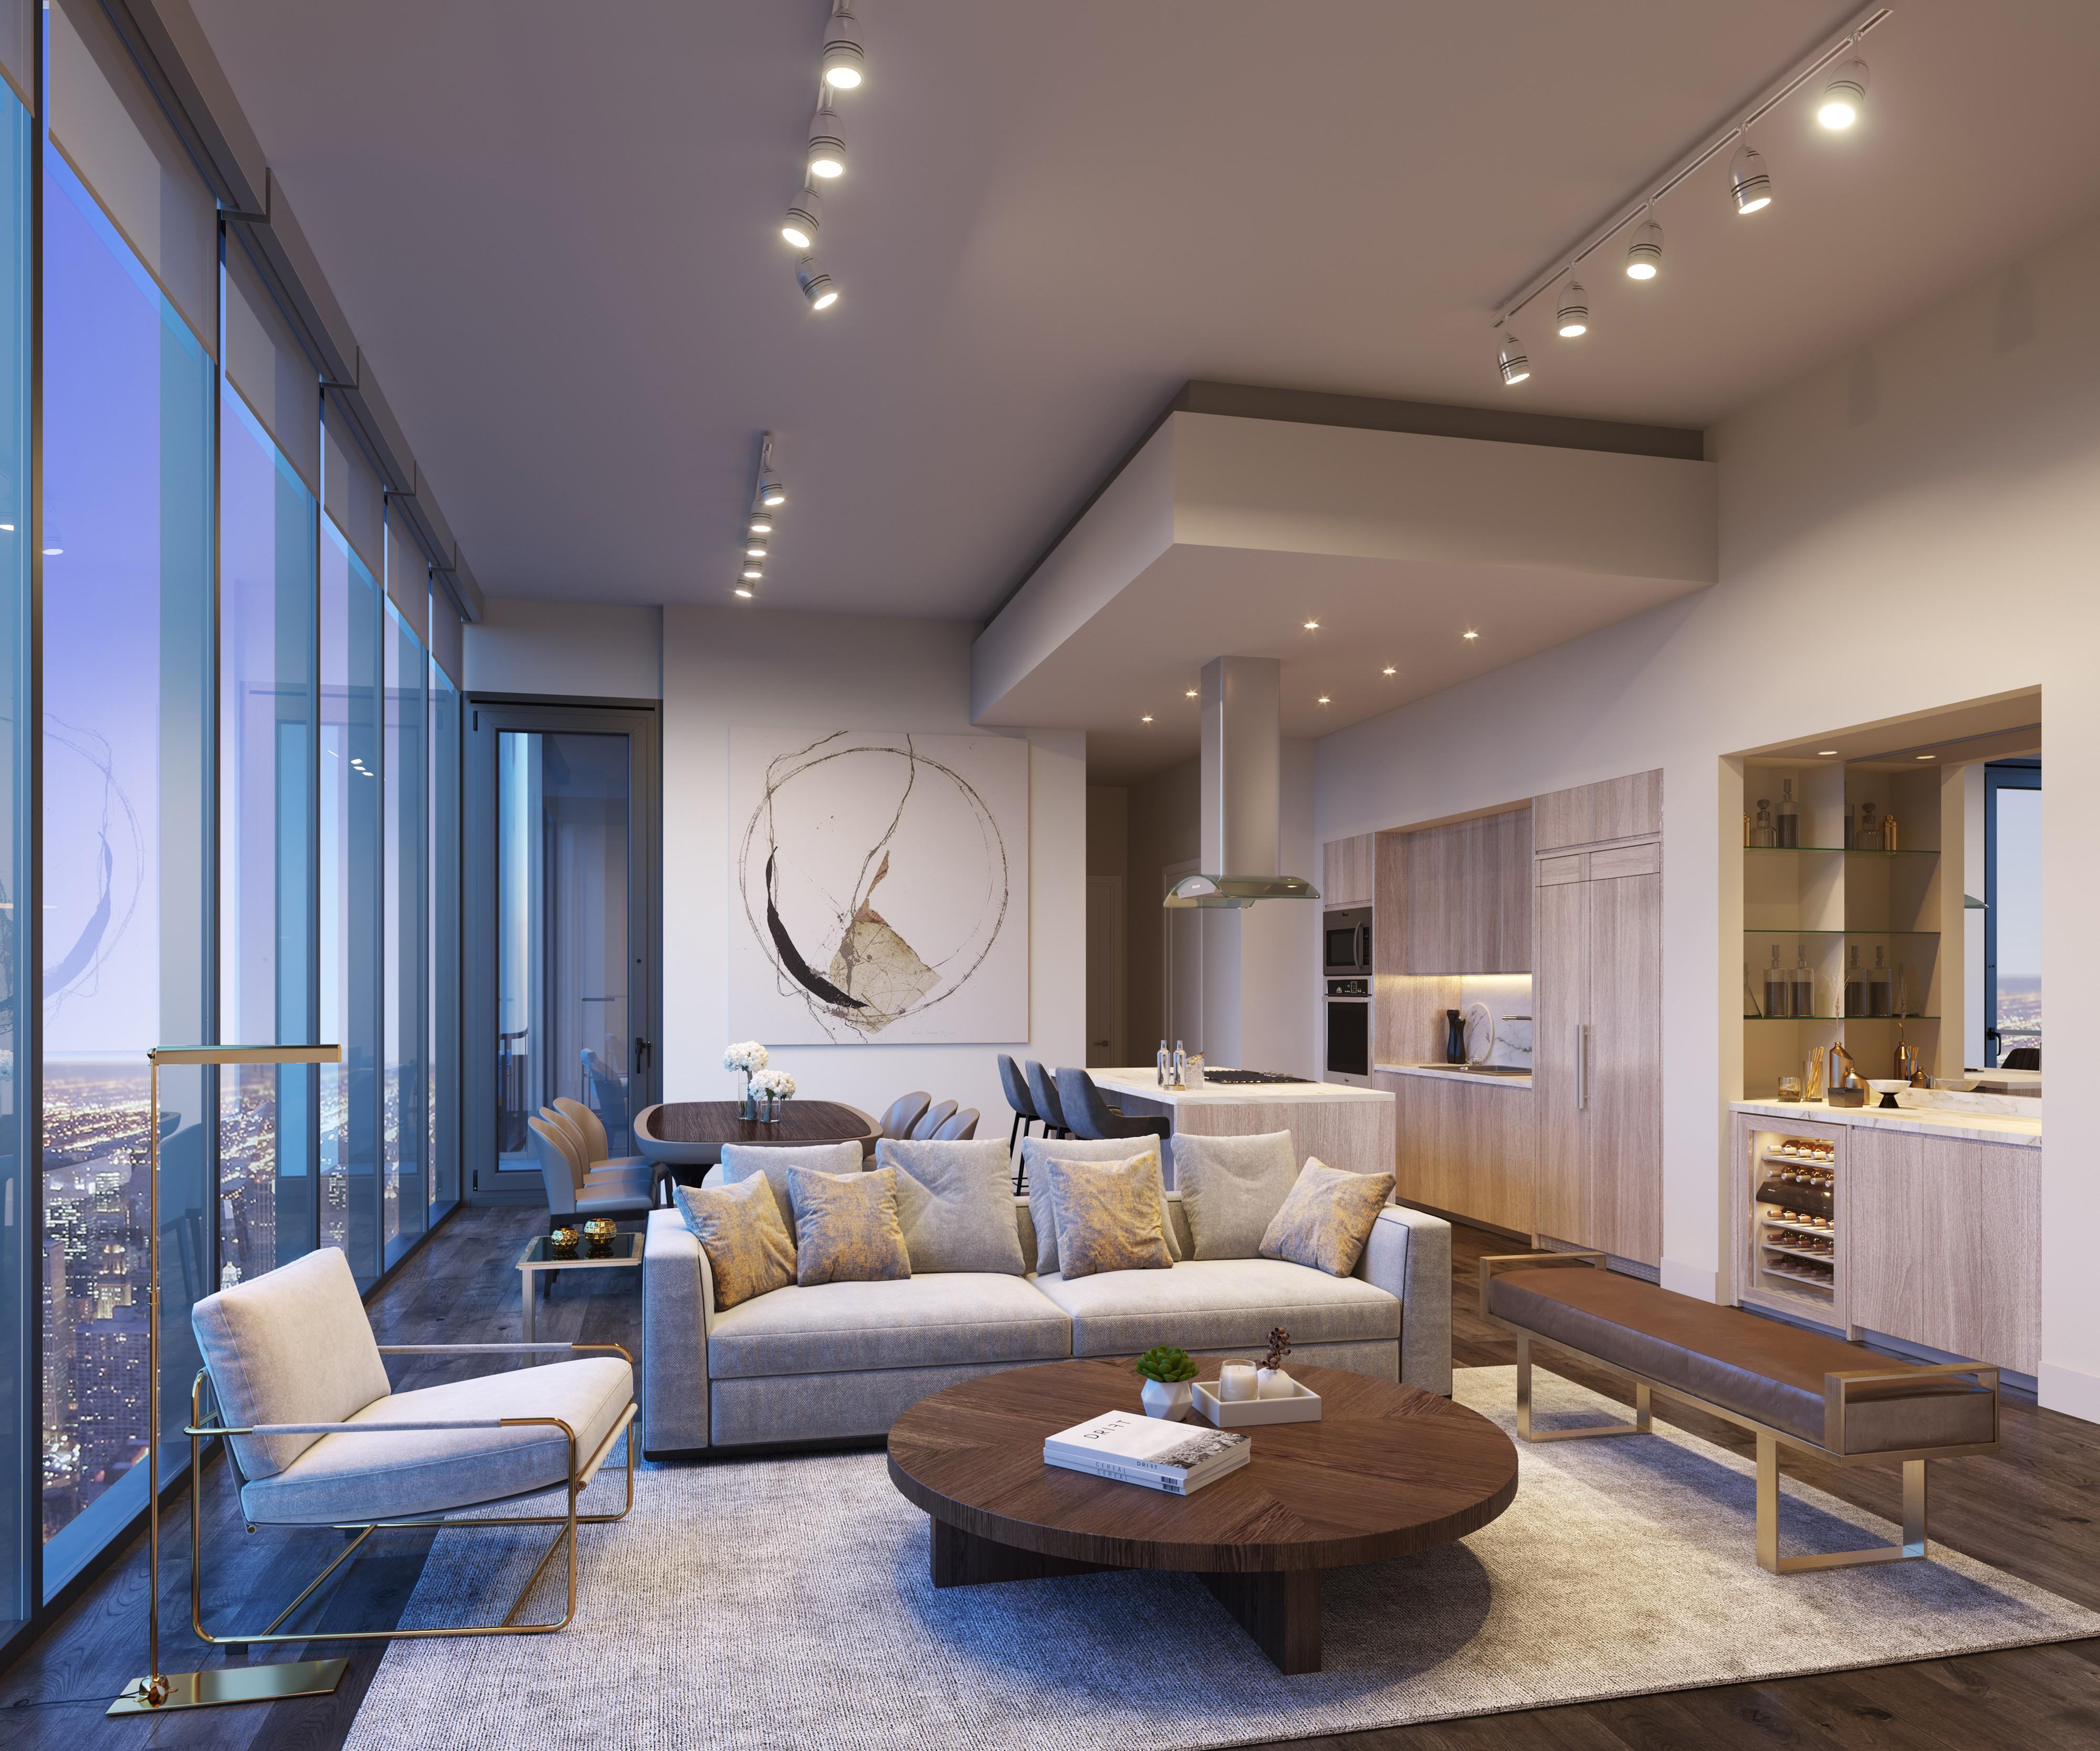 Apartments Near Rice Hanover River Oaks for Rice University Students in Houston, TX